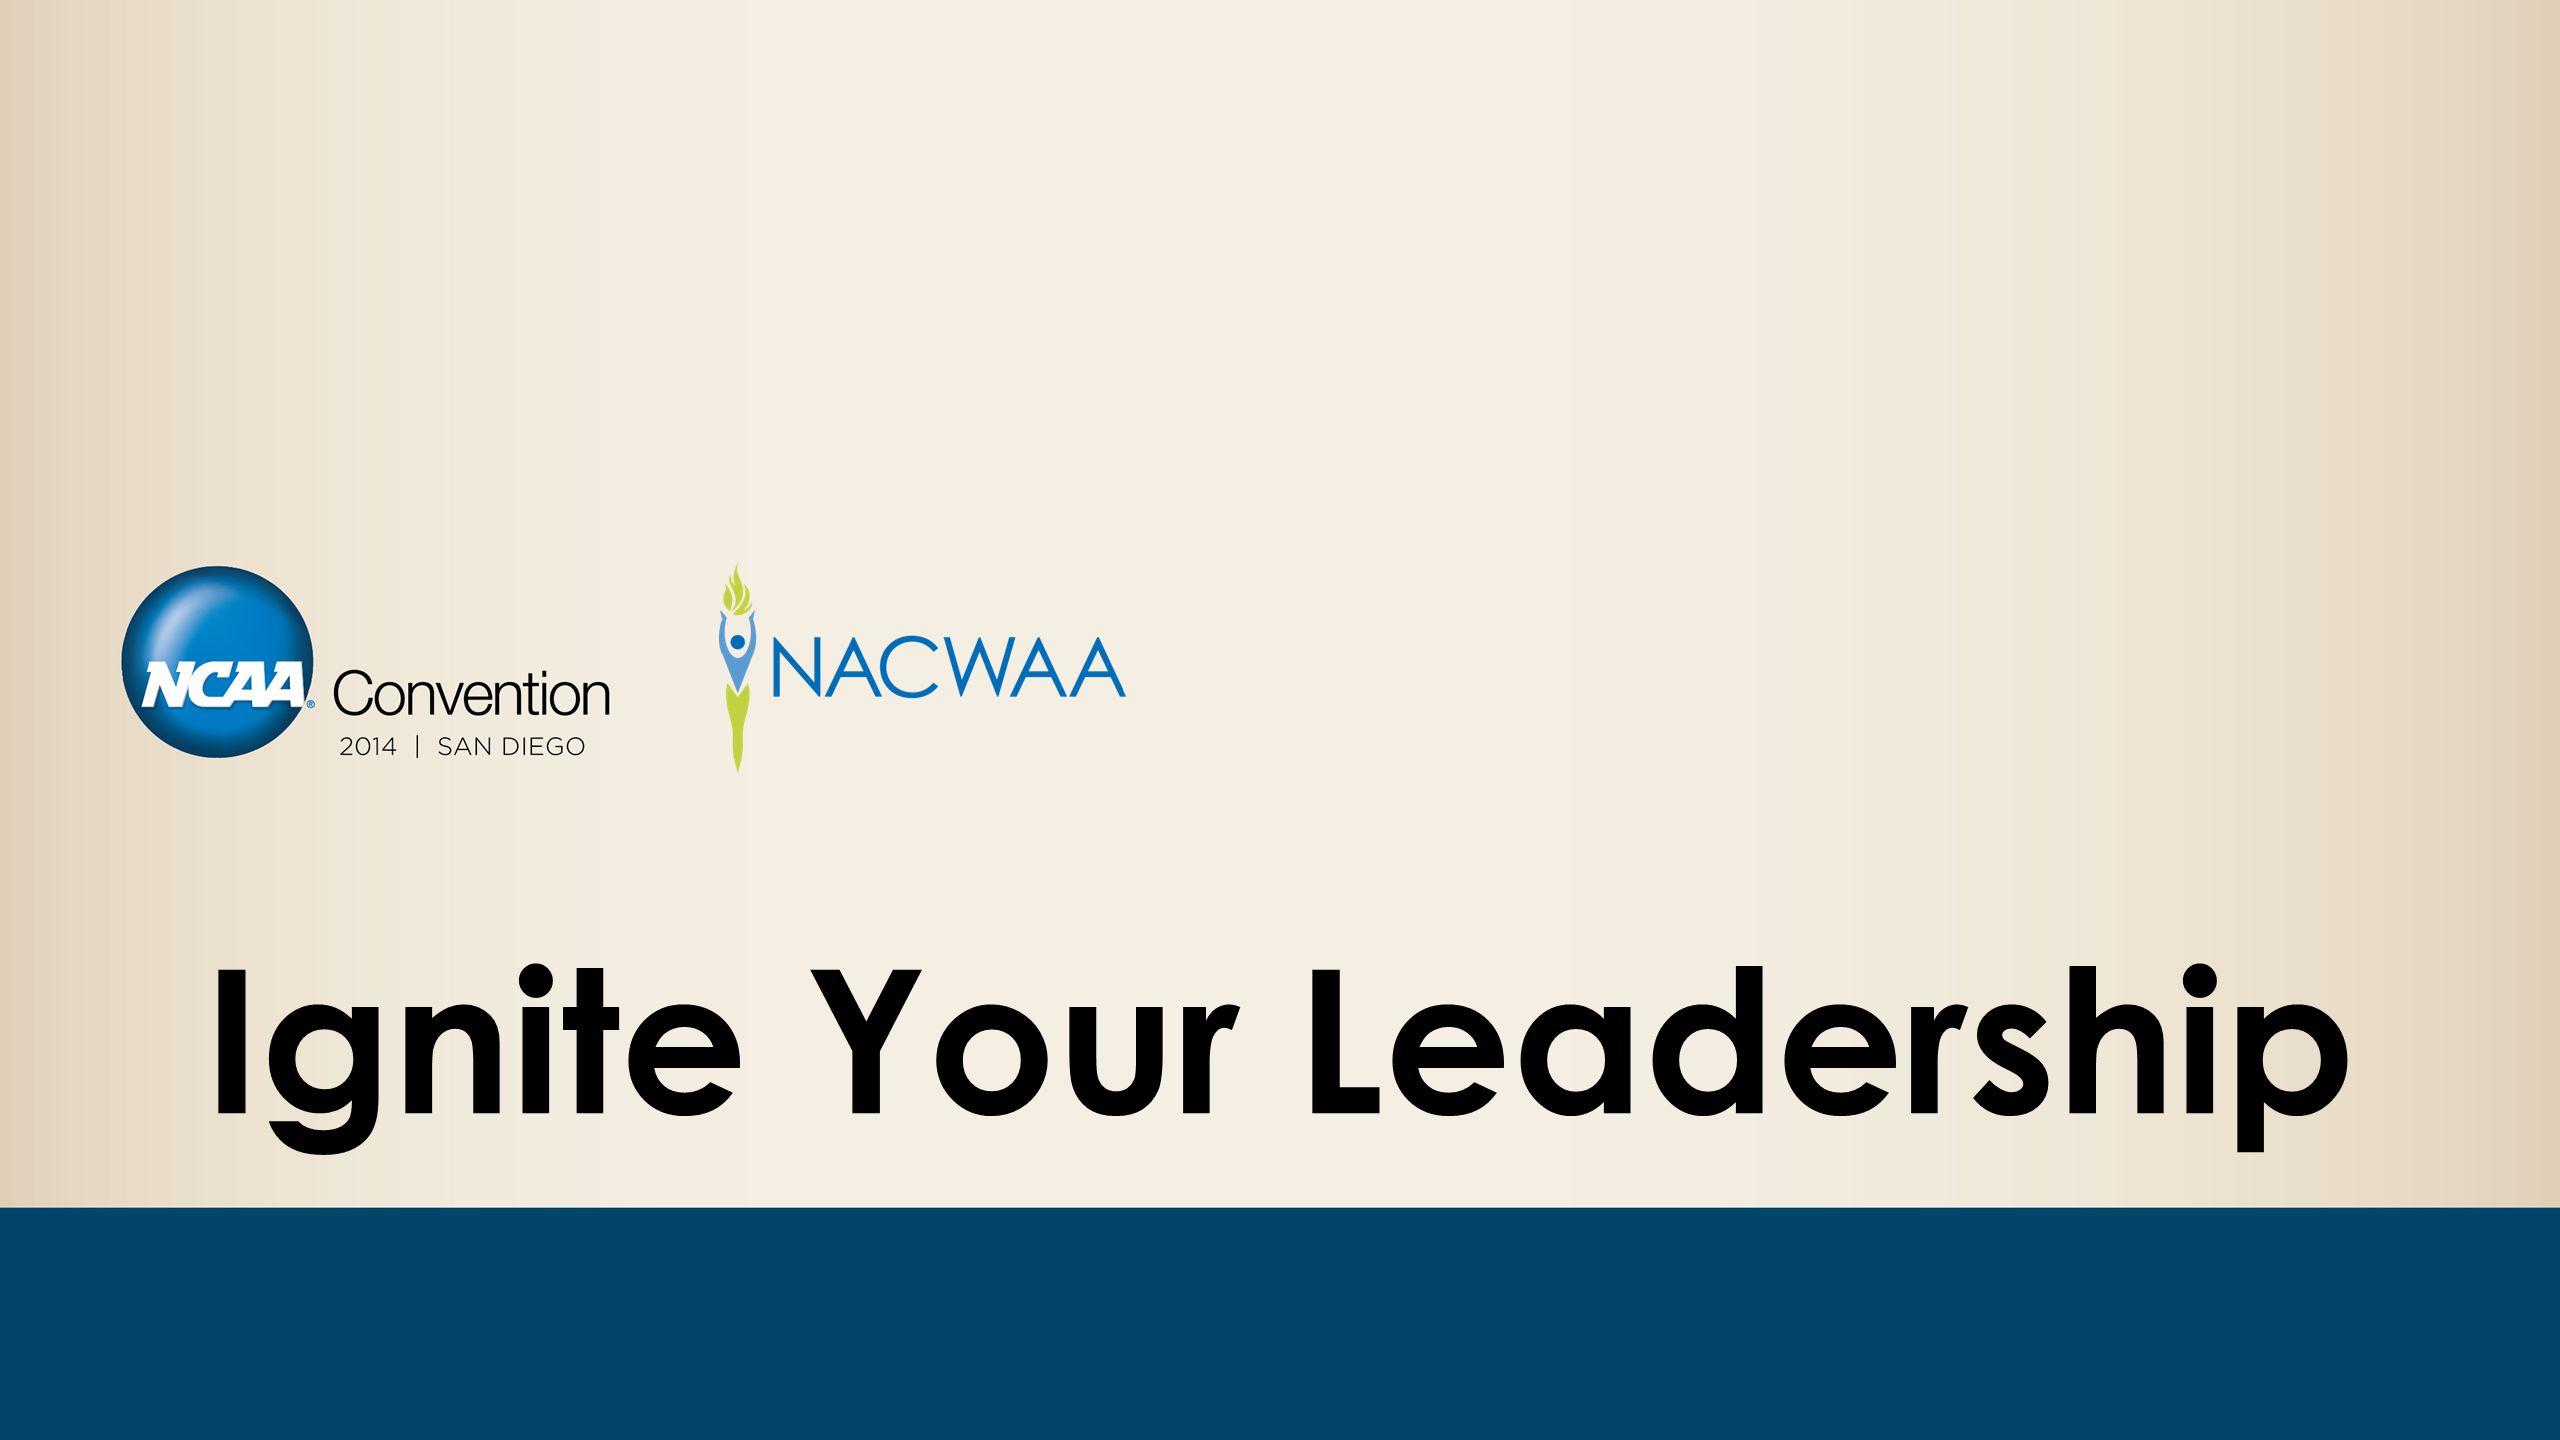 Ignite Your Leadership